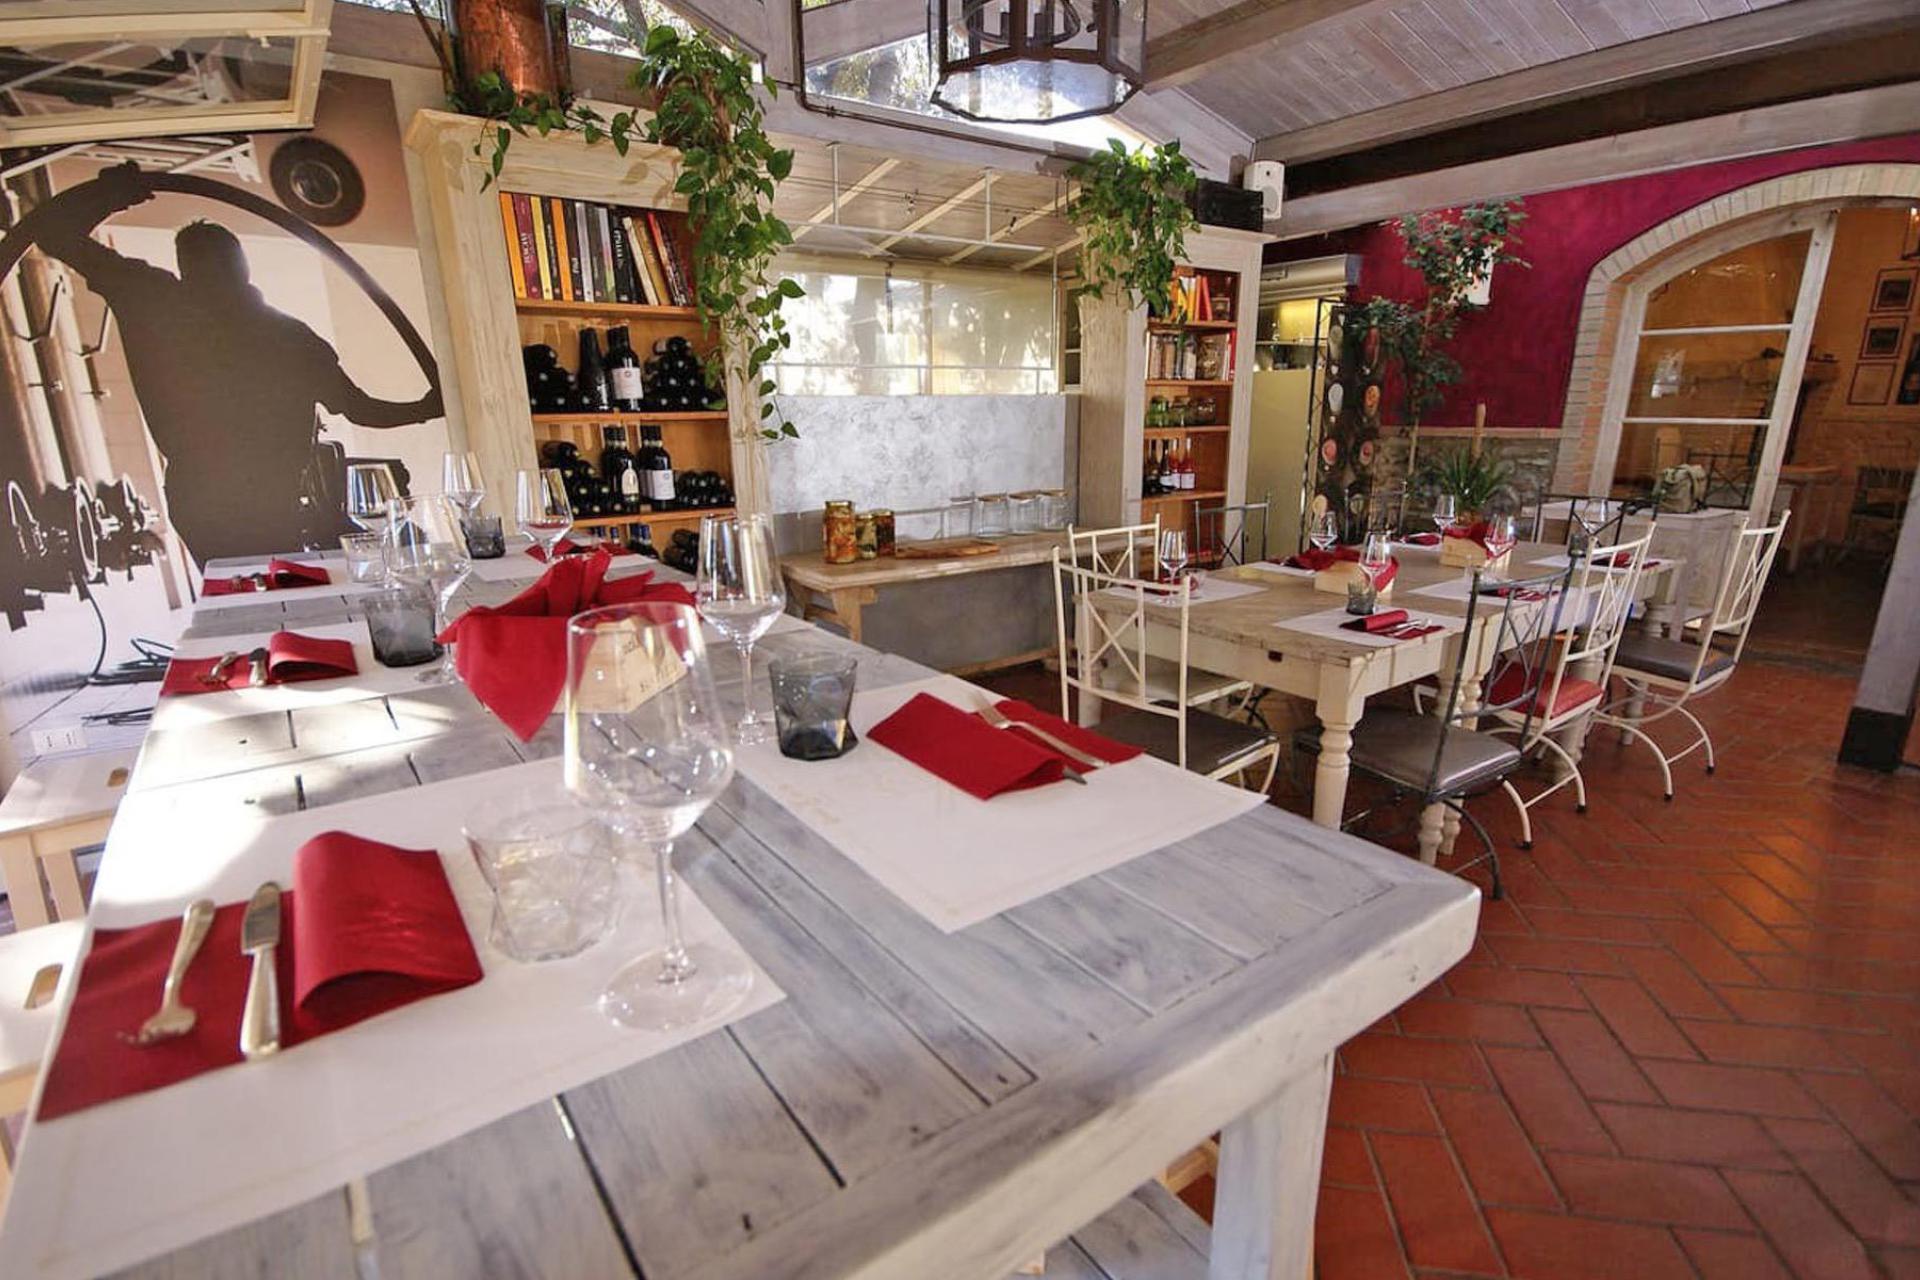 Agriturismo Tuscany Agriturismo with restaurant near the Tuscan coast